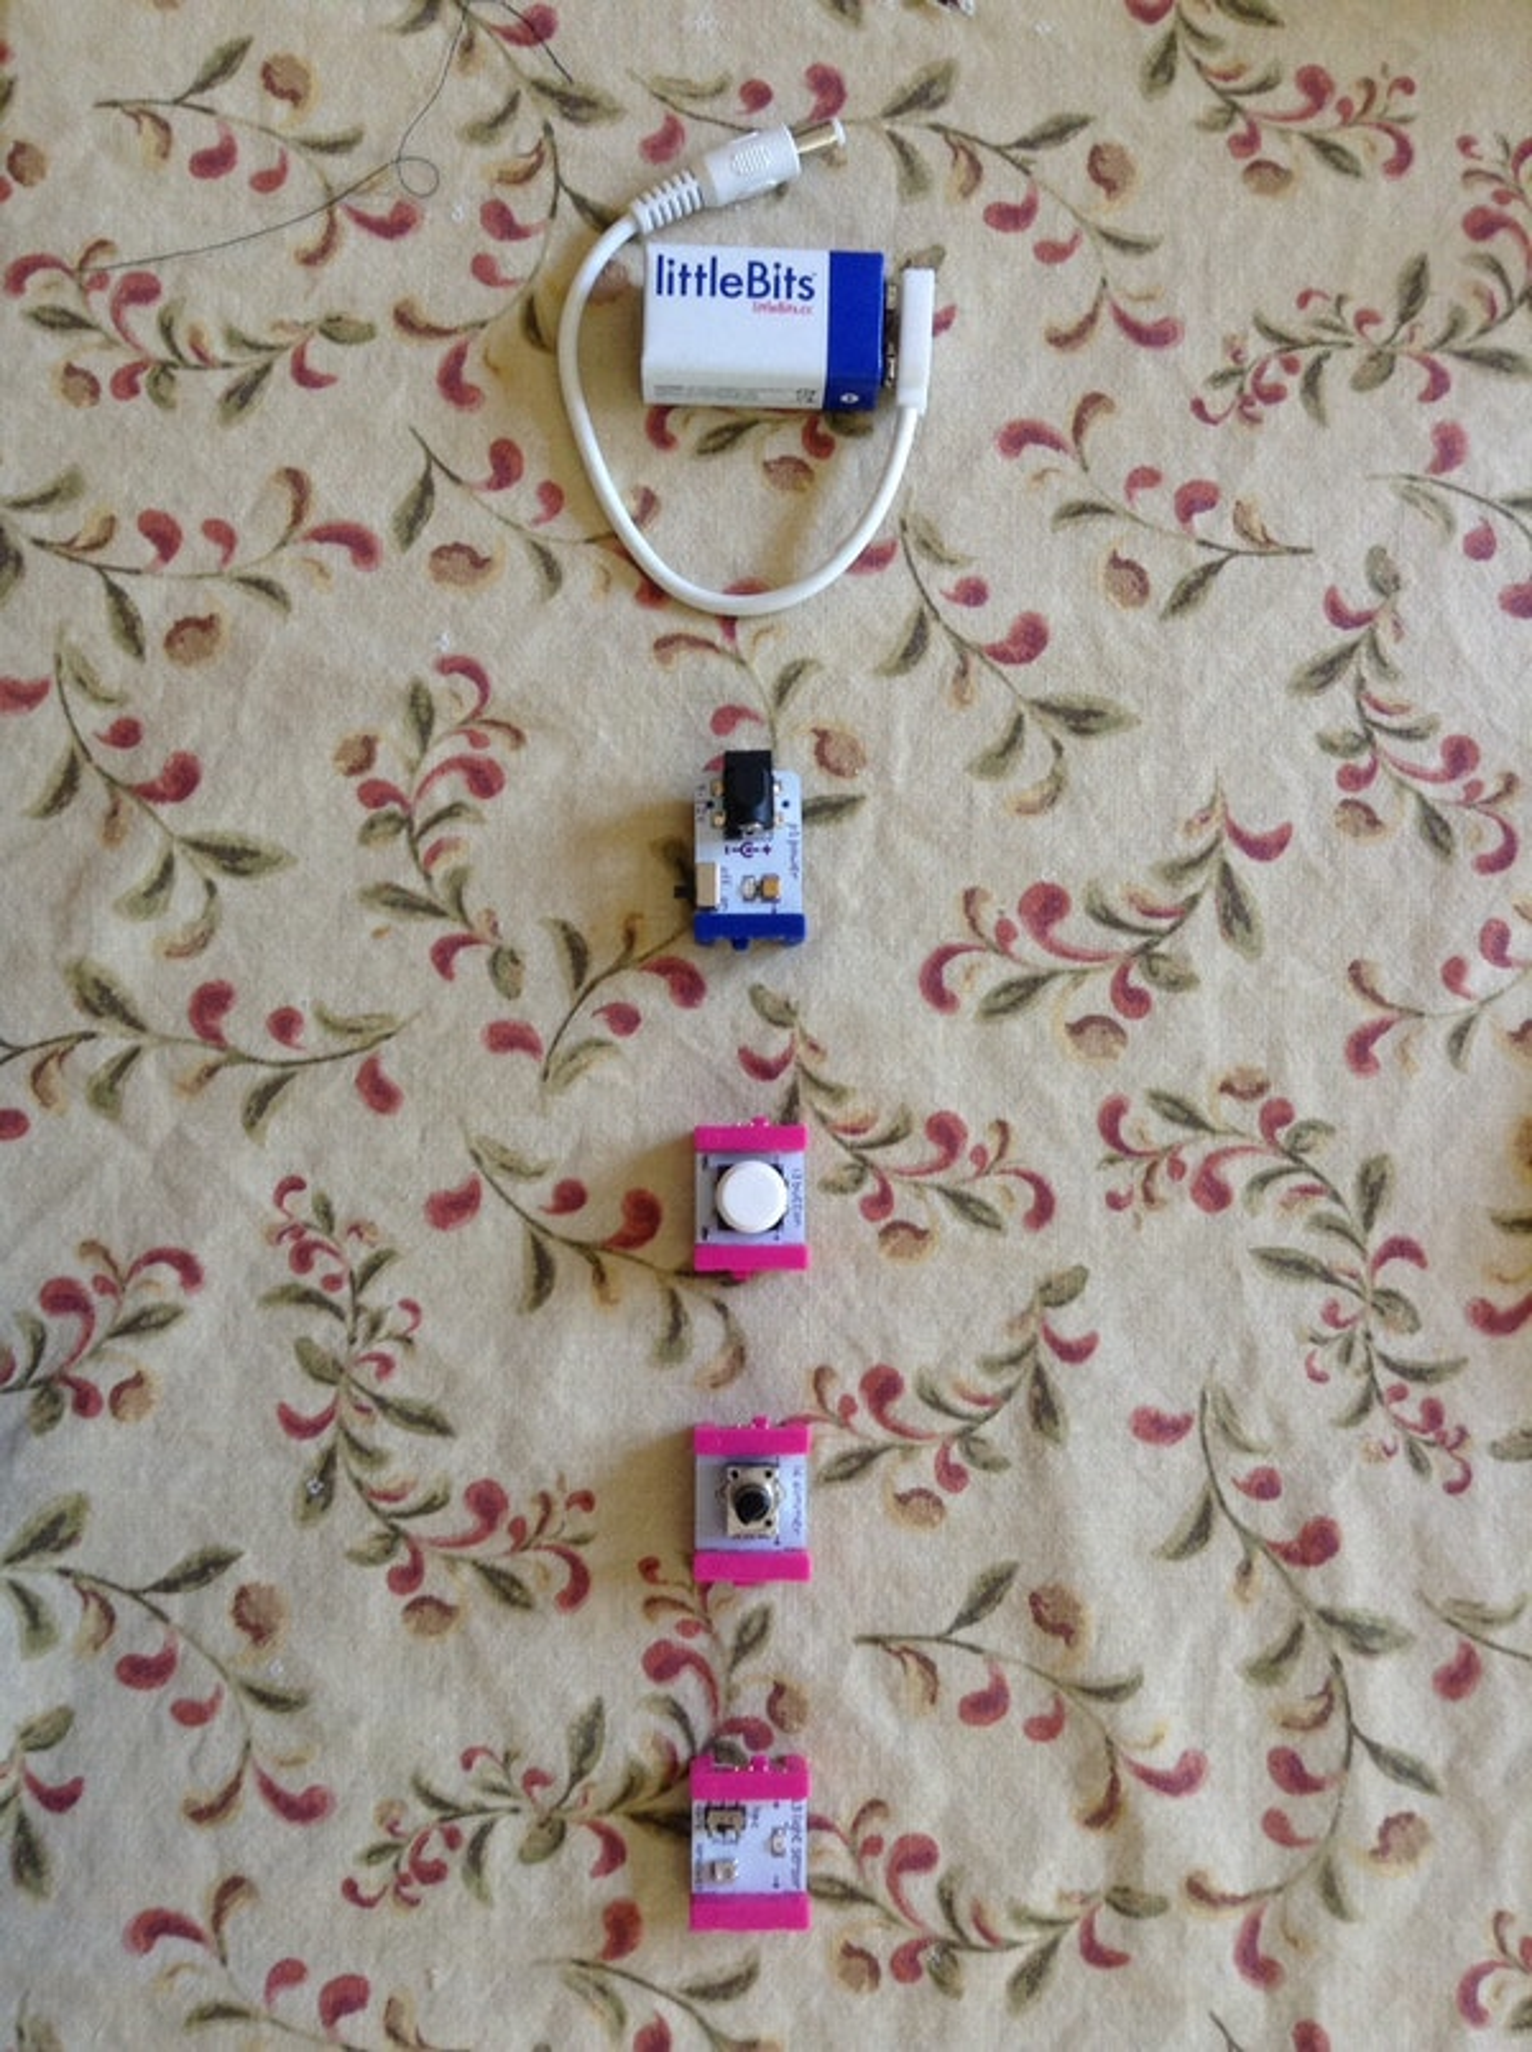 ec5f0a034 Inverter: a littleBits Project by Dance Dog